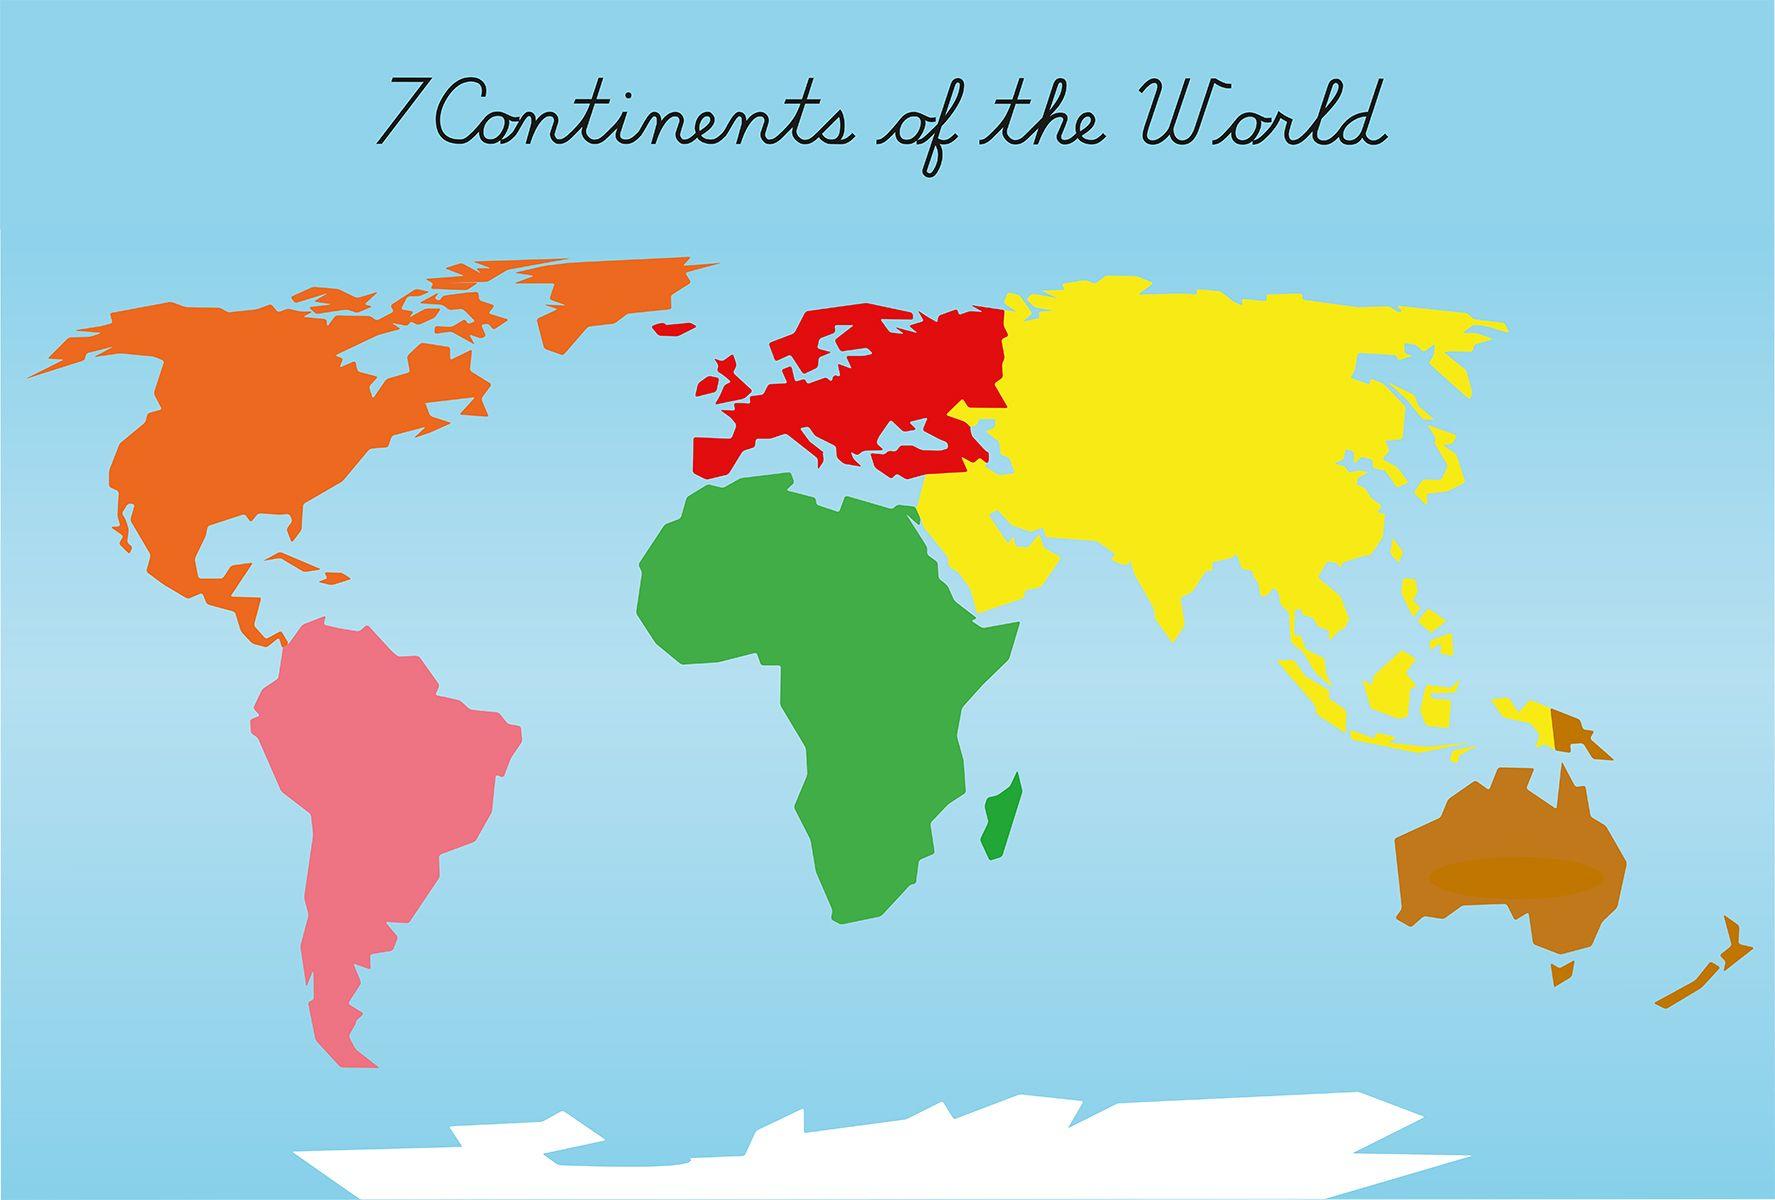 Montessori Puzzle Maps - 7 Continents Of The World | Montessori - Montessori World Map Free Printable